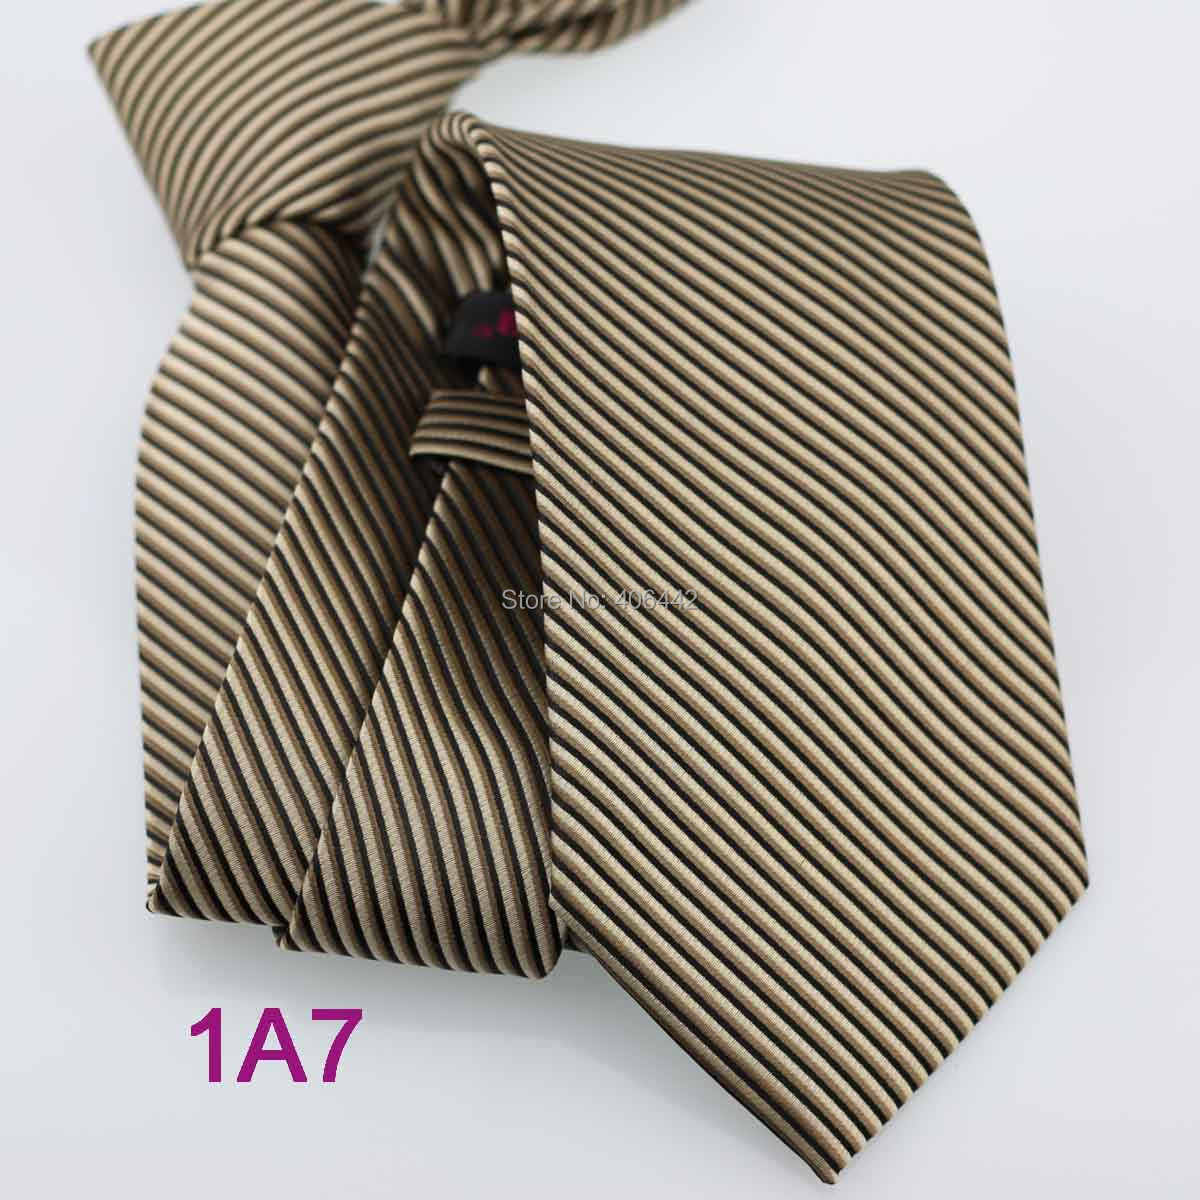 Coachella pria Kopi Dengan Hitam Stripes Jacquard Woven Dasi Neck Tie untuk mencocokkan kemeja Formal Wedding dresses